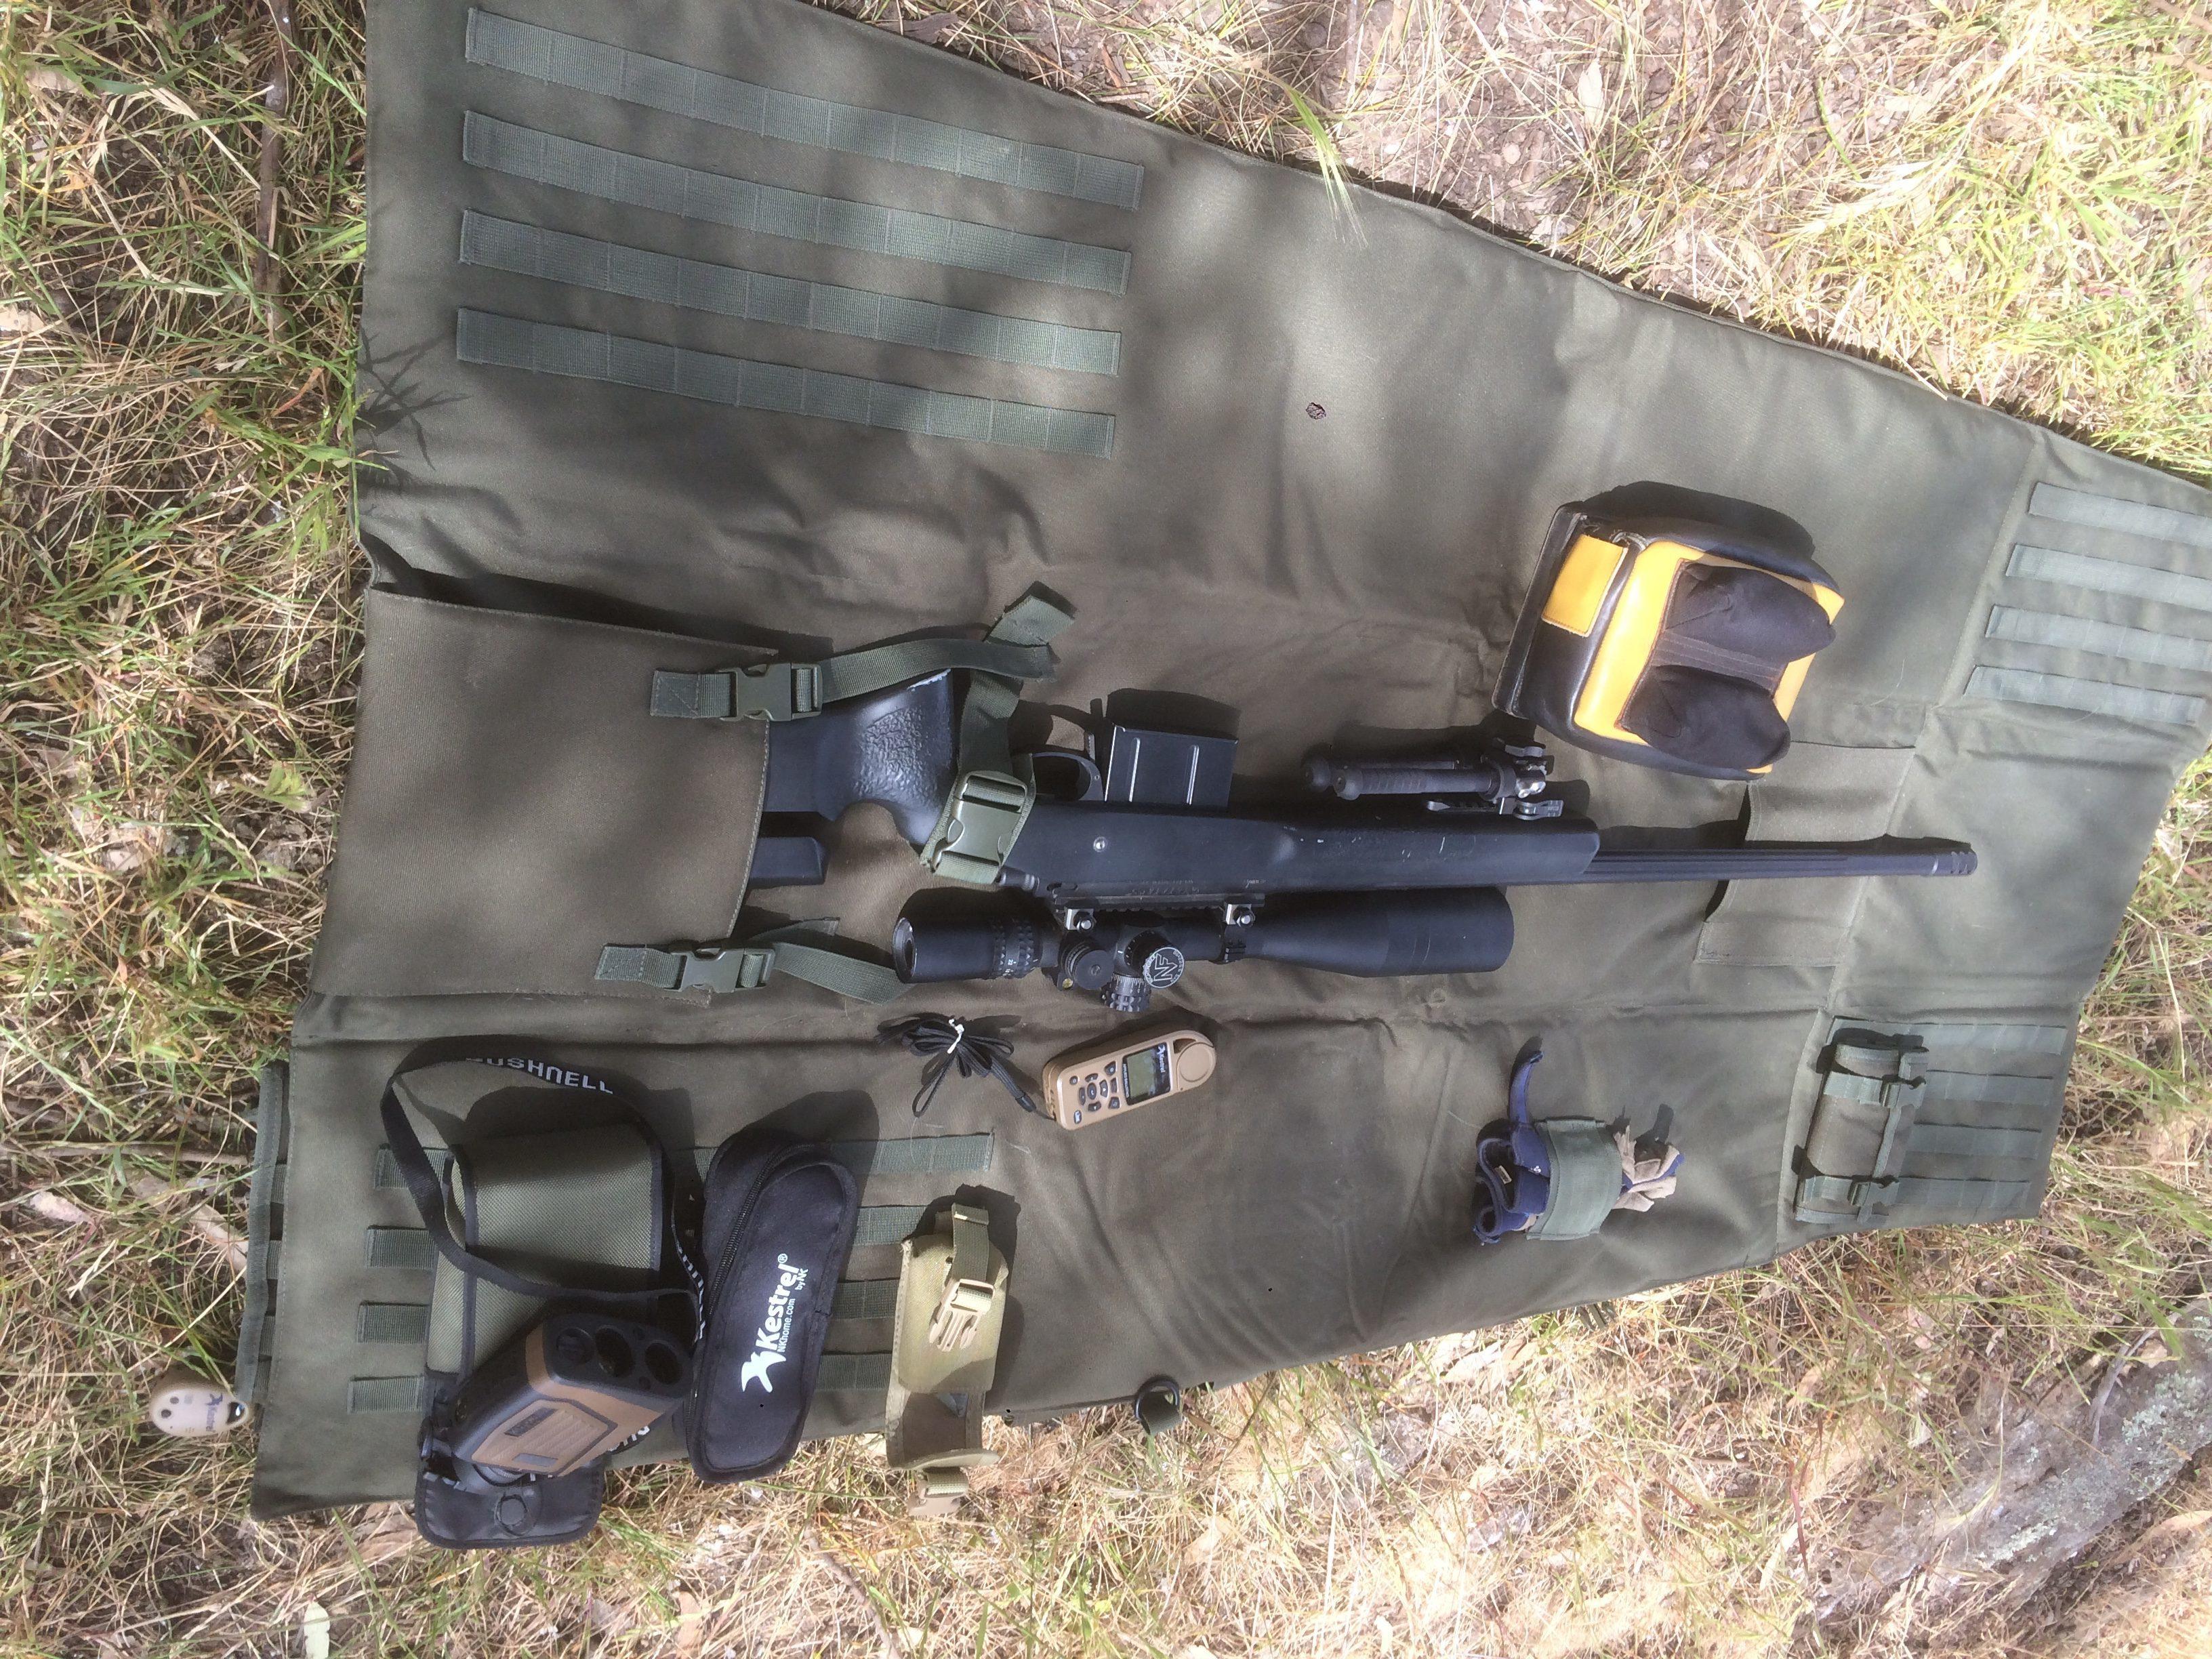 Kestrel Drop Ballistics